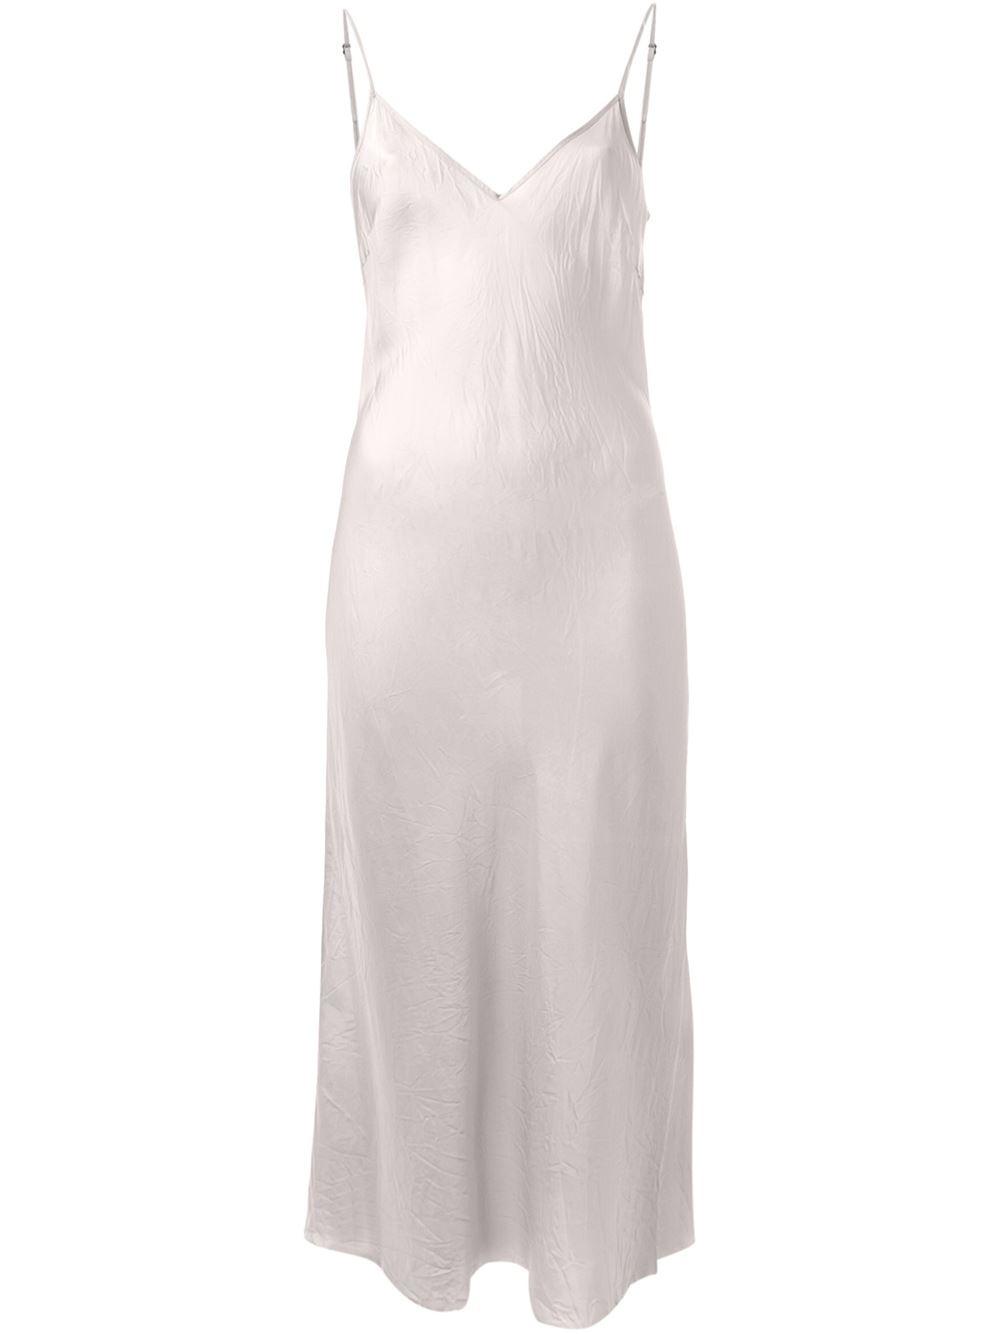 Organic by John Patrick Midi Slip Dress